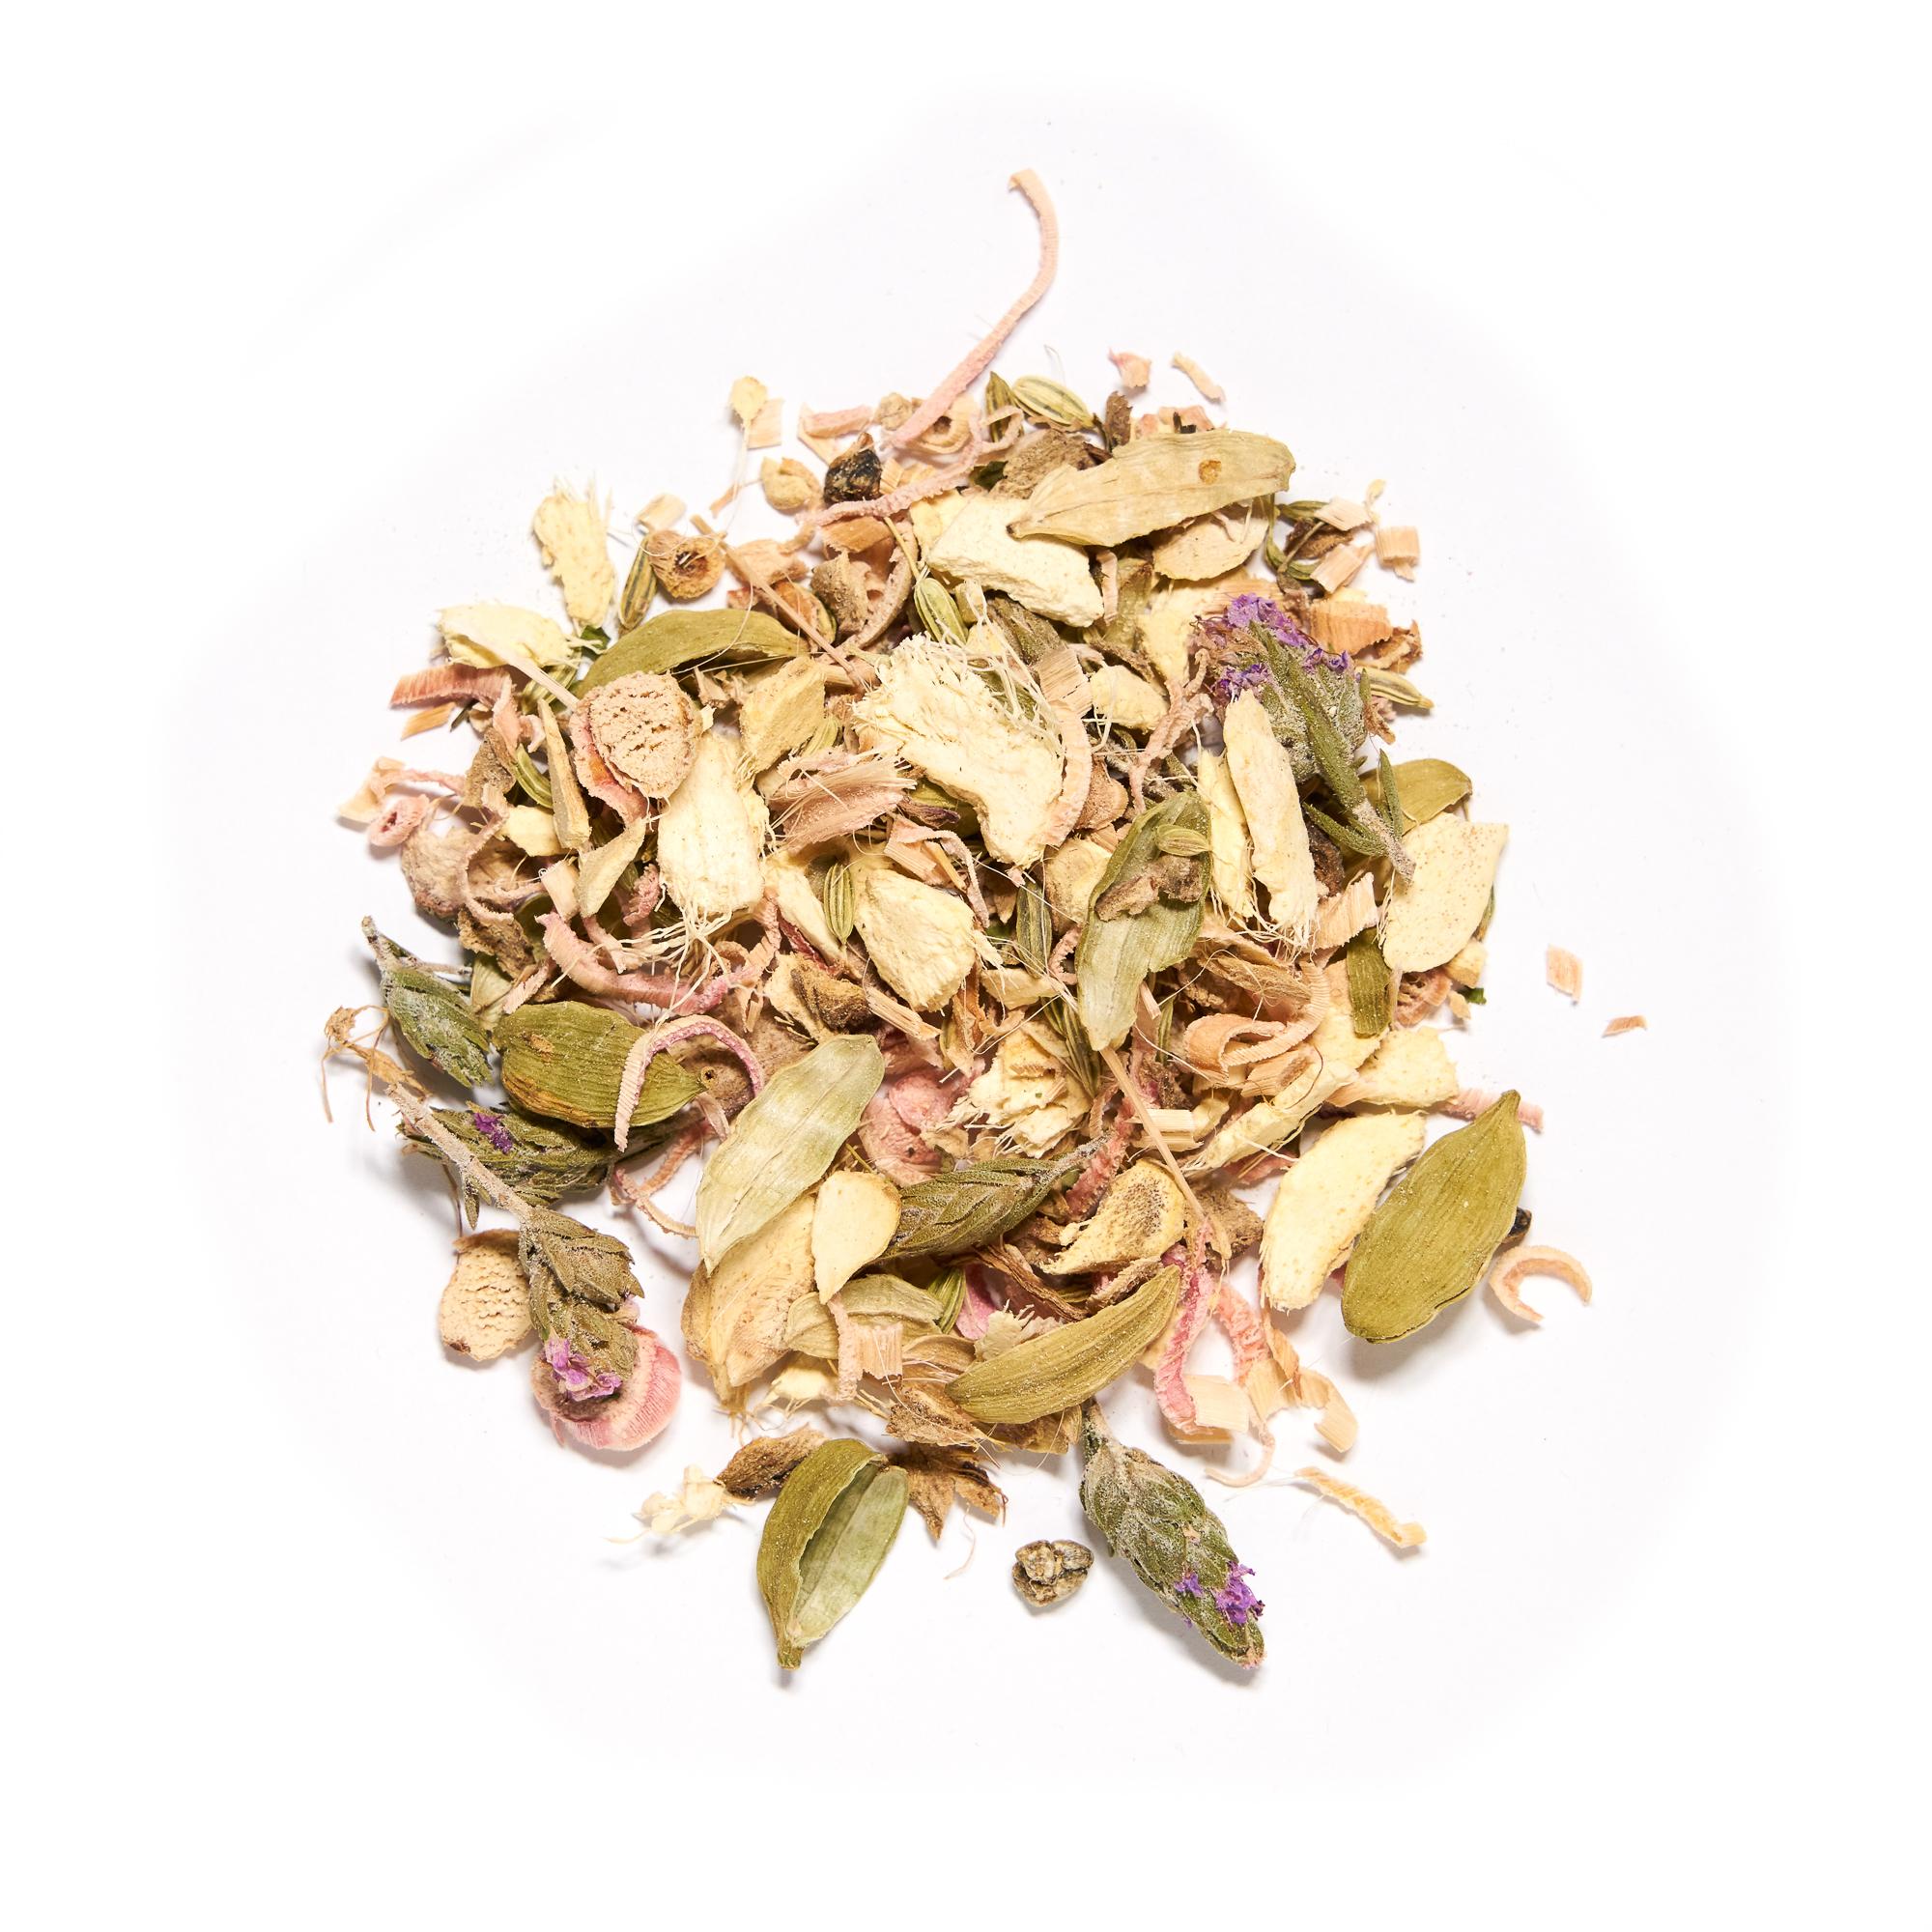 tisane-citronnee-au-gingembre